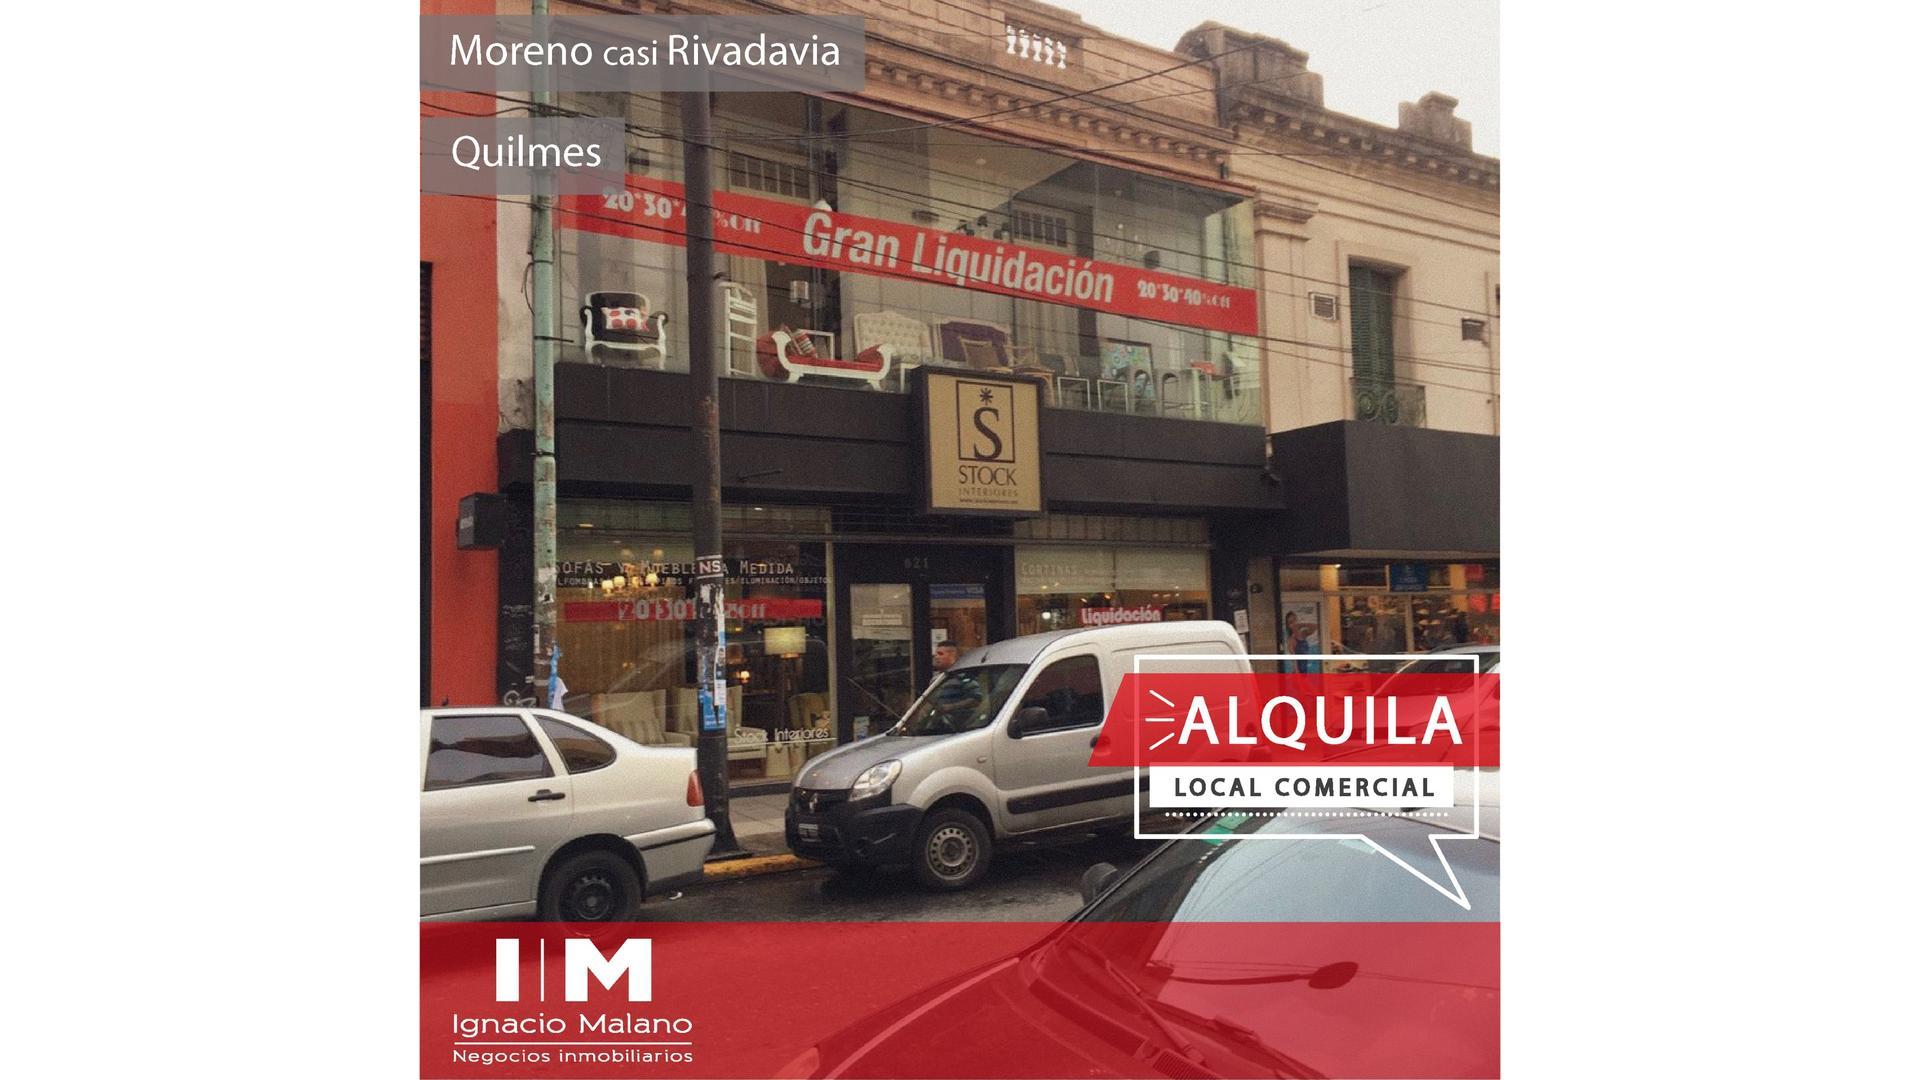 Moreno 600 - $ 150.000 - Local Alquiler